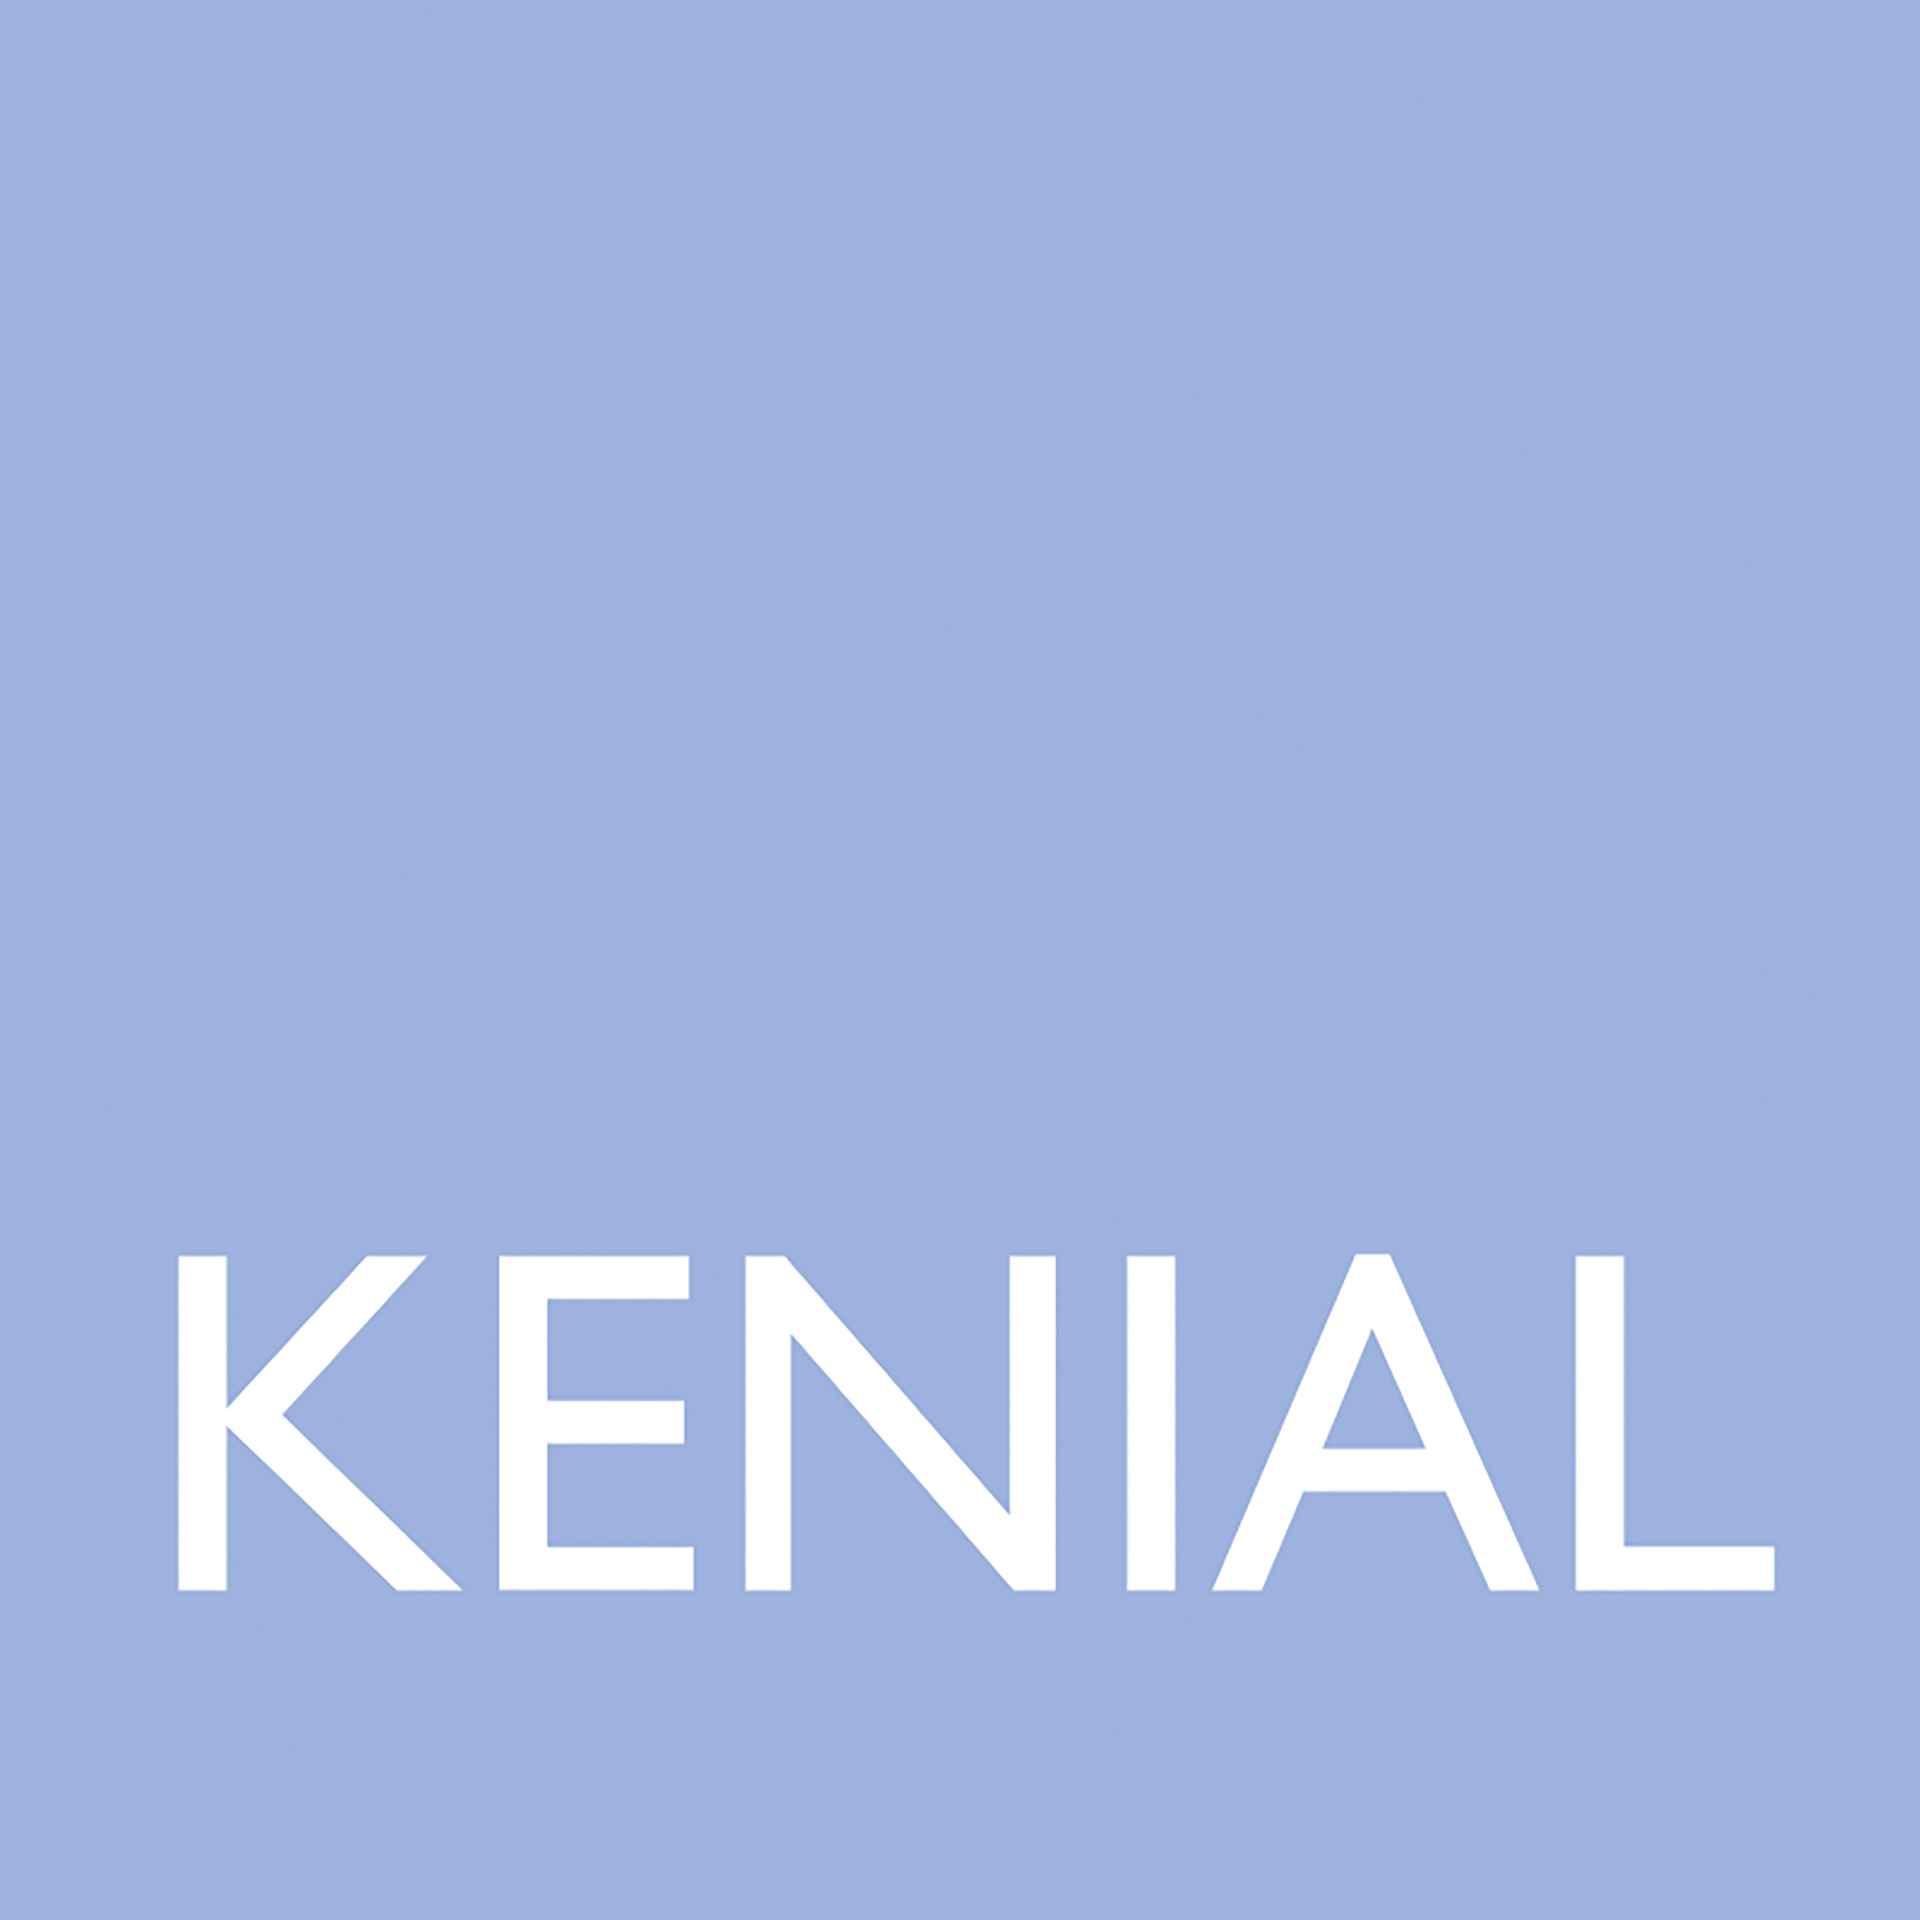 kenial_logo